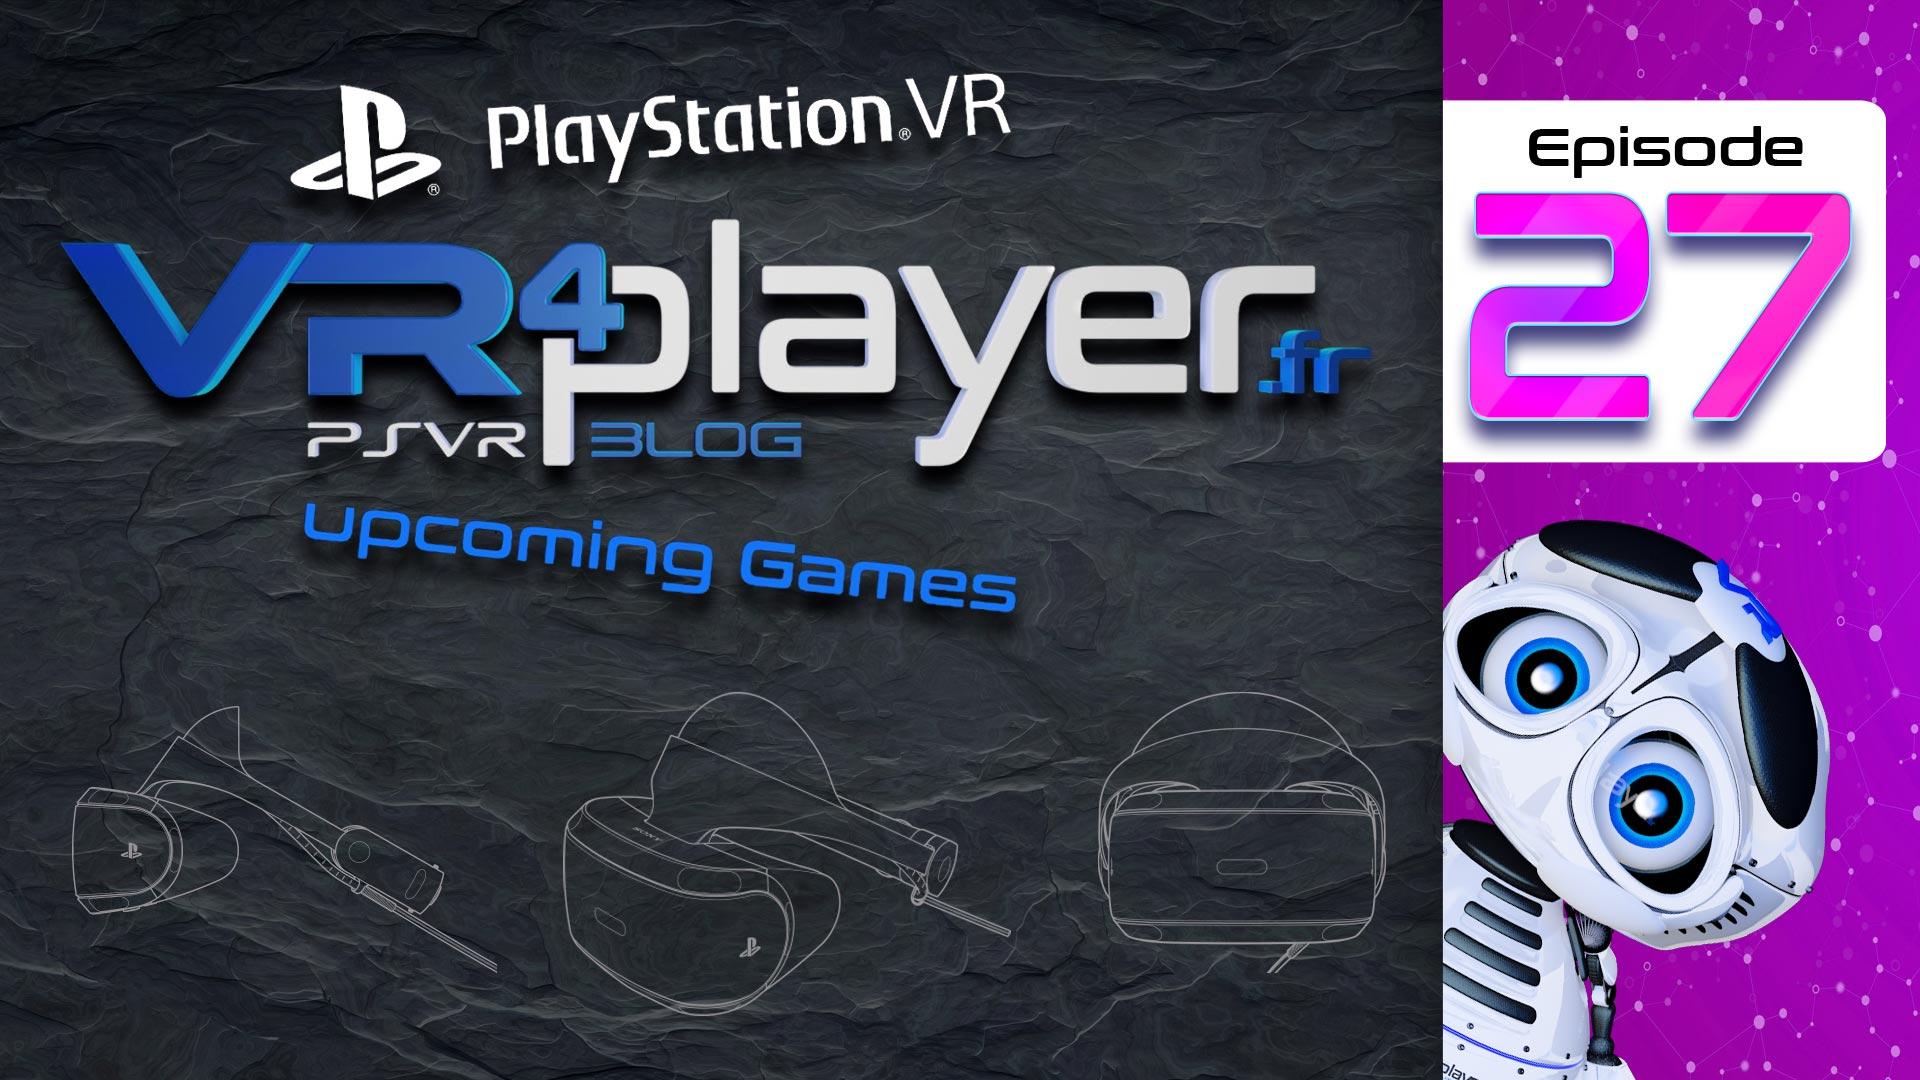 PlayStation VR Upcoming games Episode 27